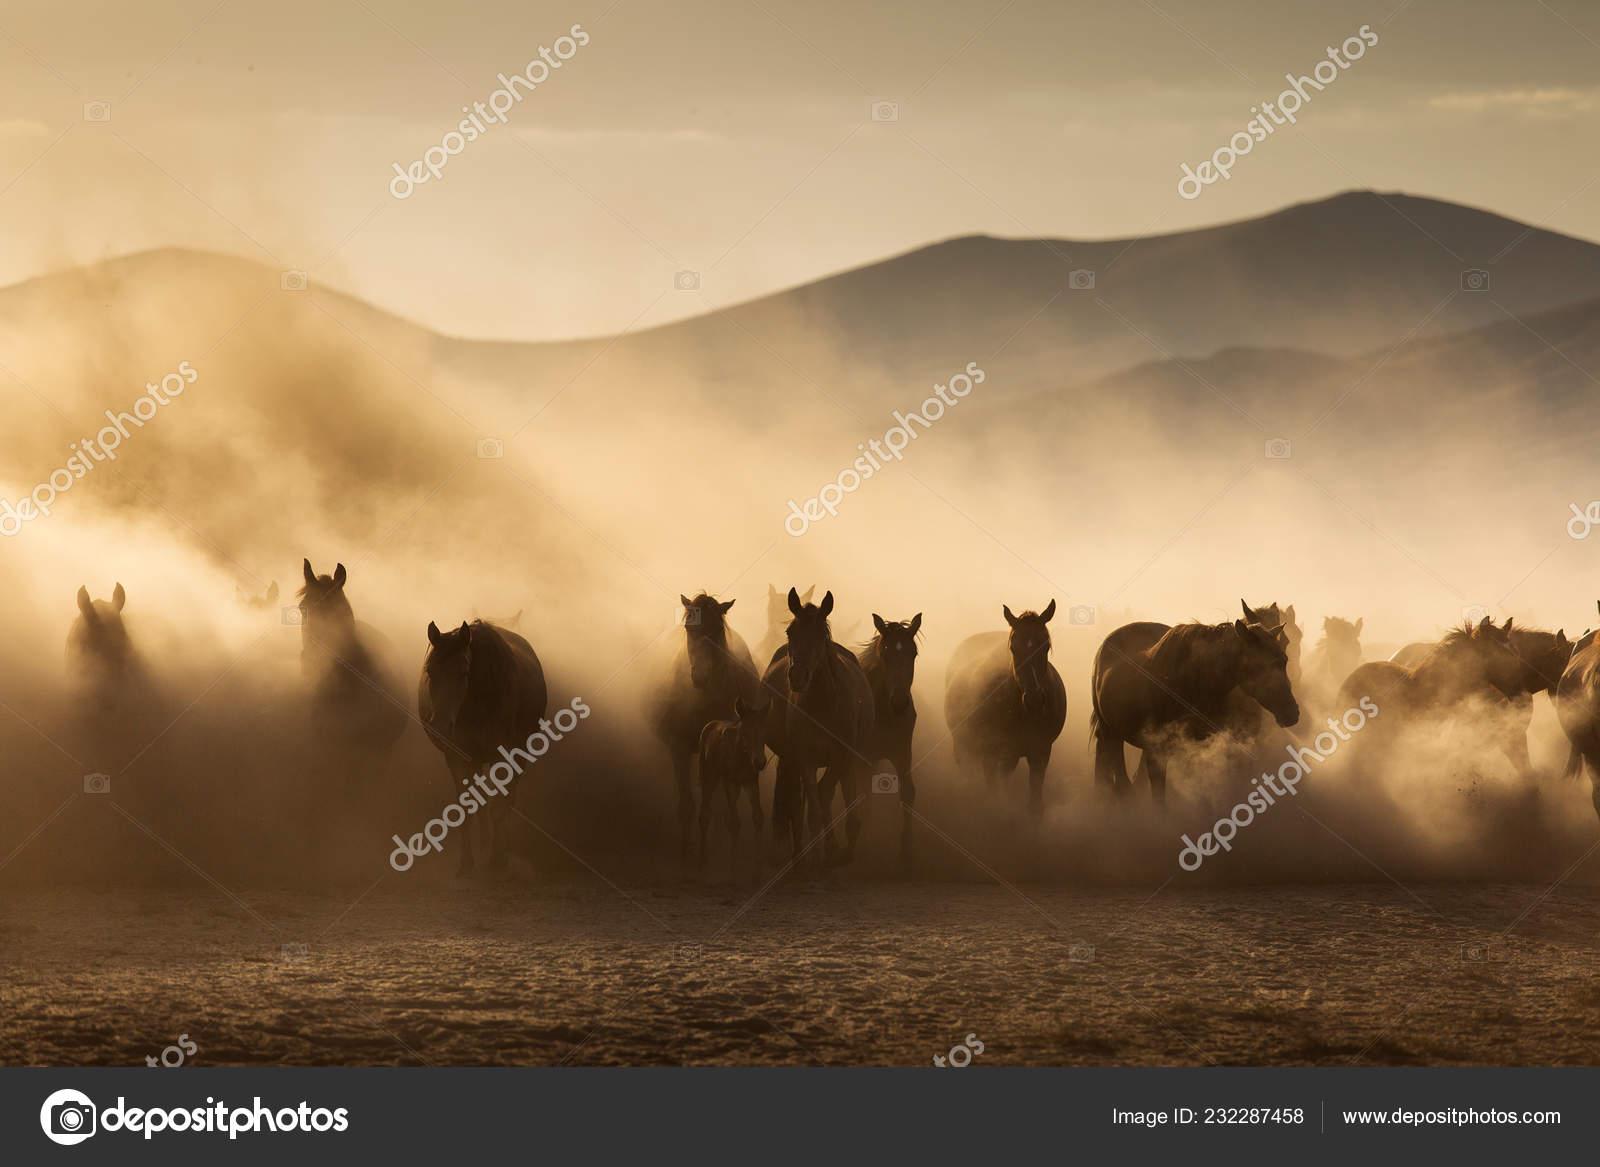 Landscape Wild Horses Running Sunset Dust Background Stock Photo C Danmir12 232287458